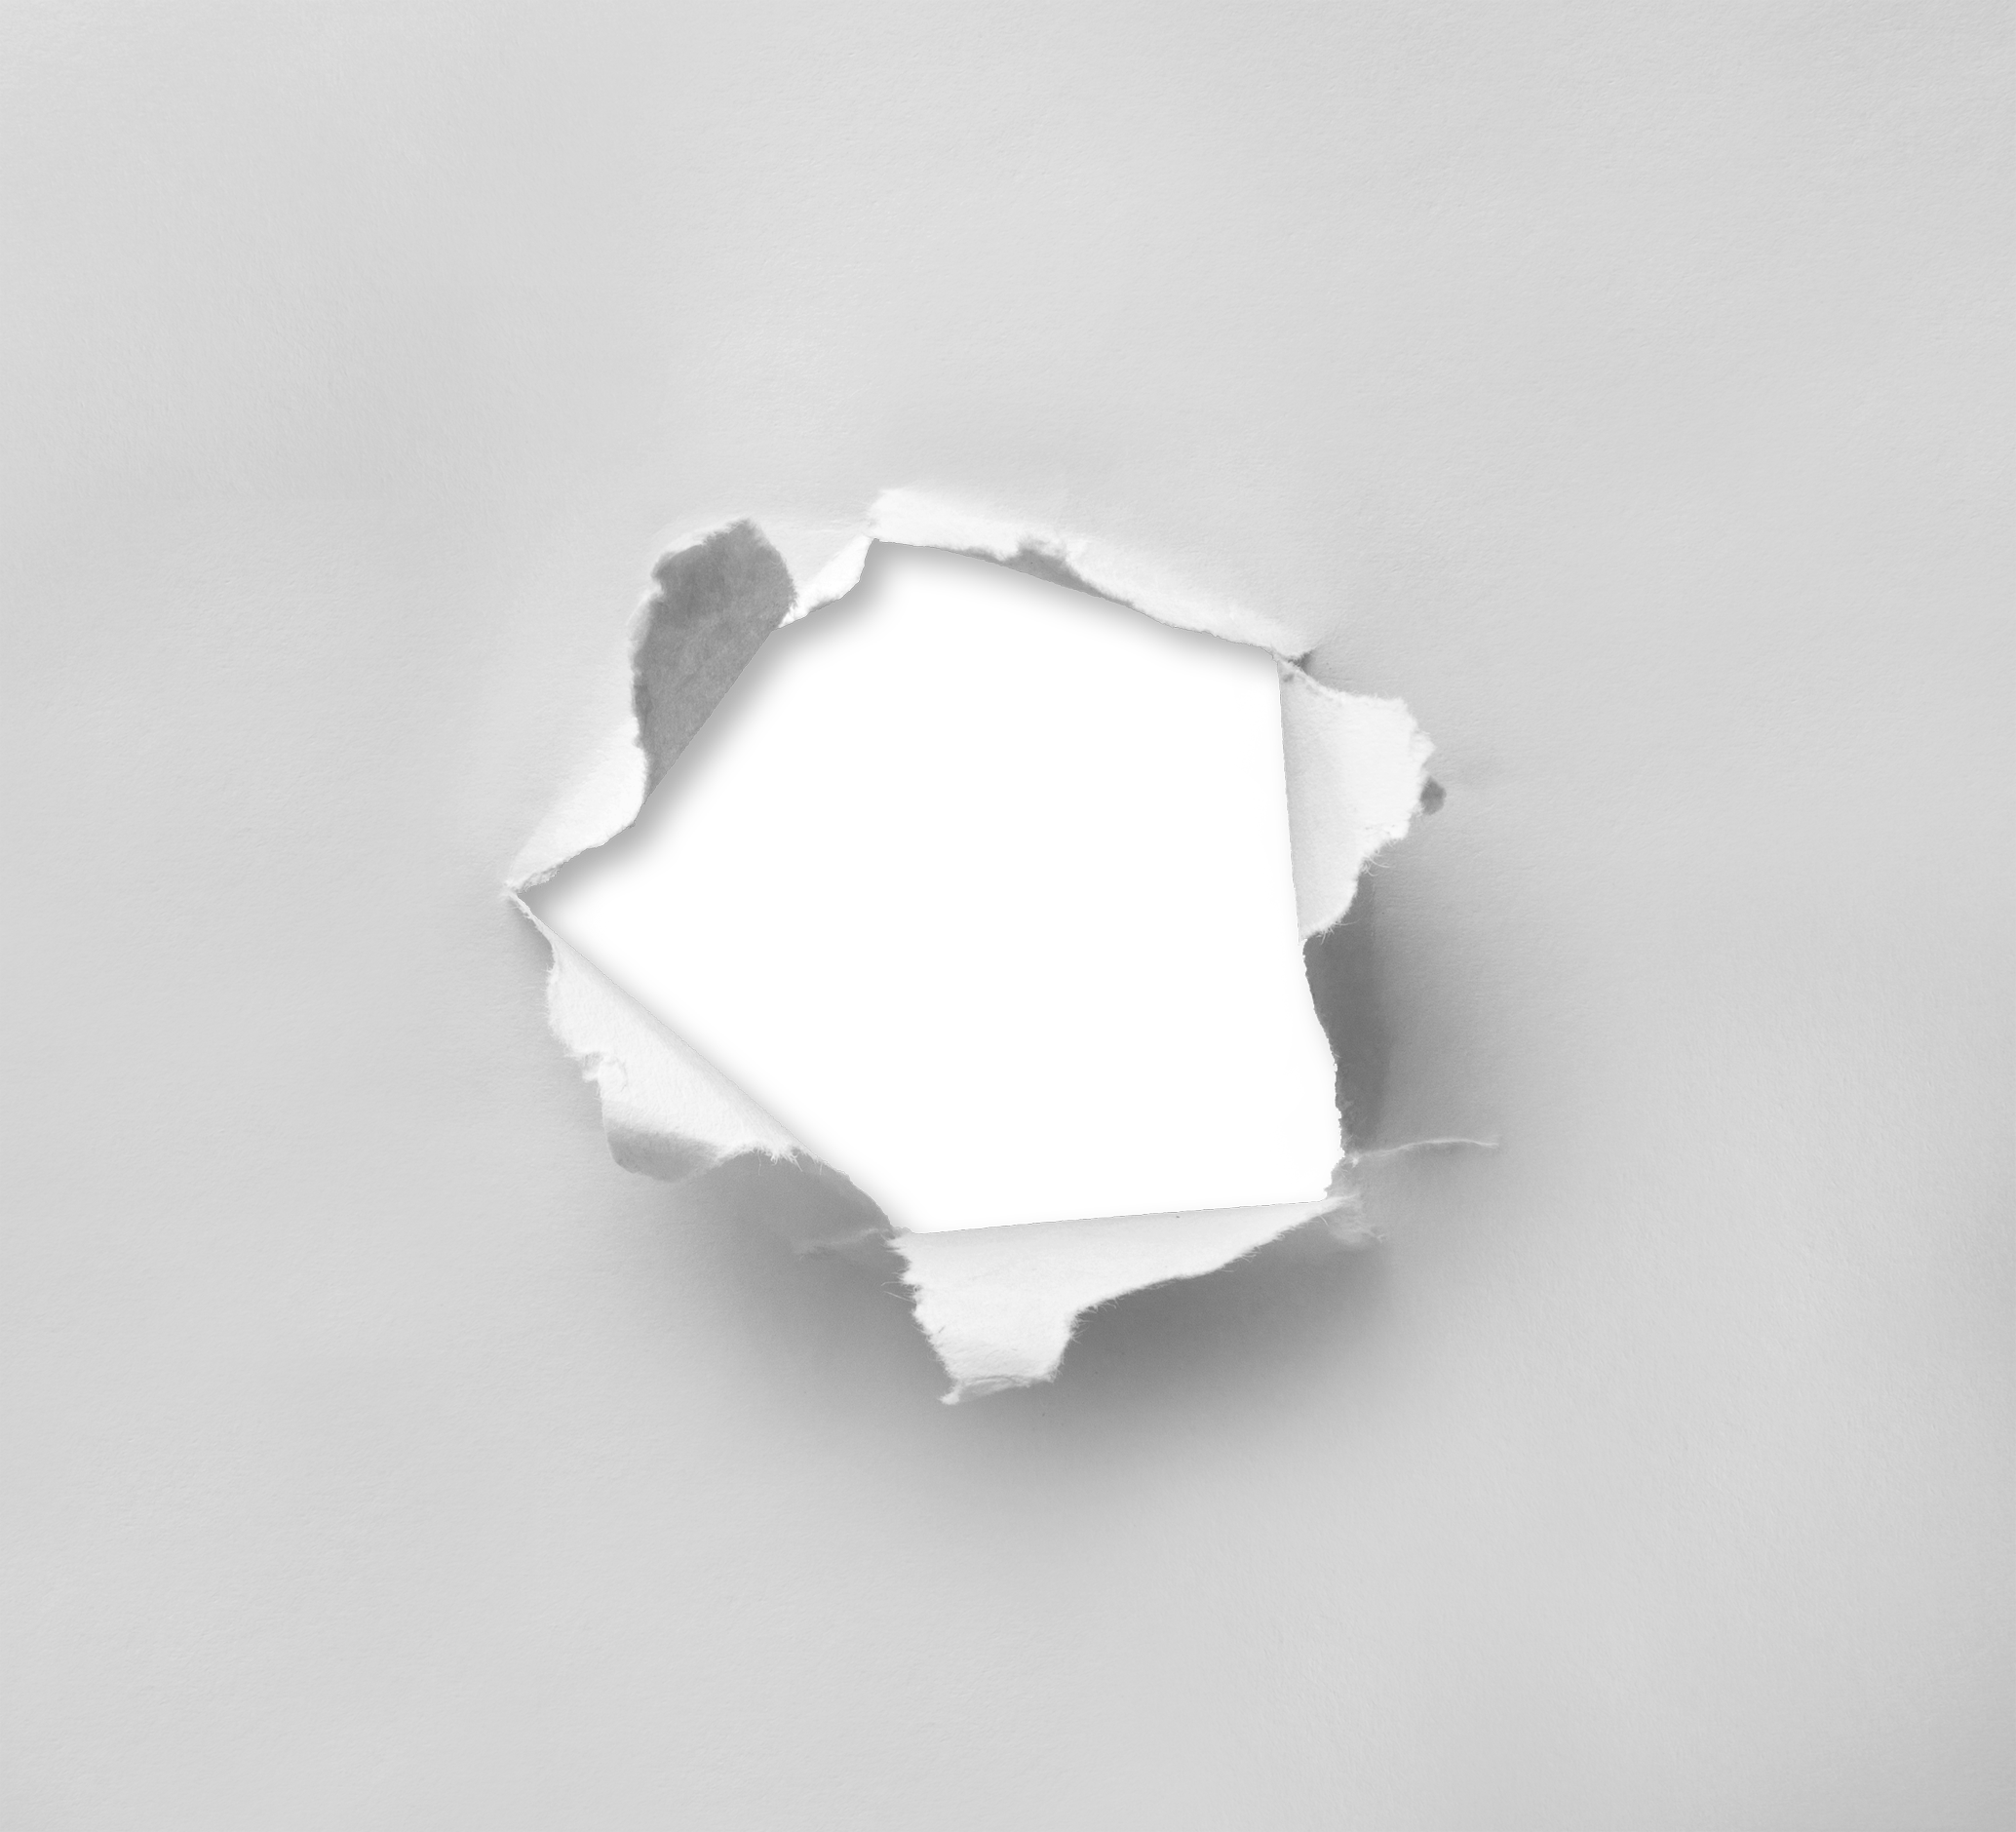 Torn Paper, Hole, Mylene, Paper, Tear, HQ Photo